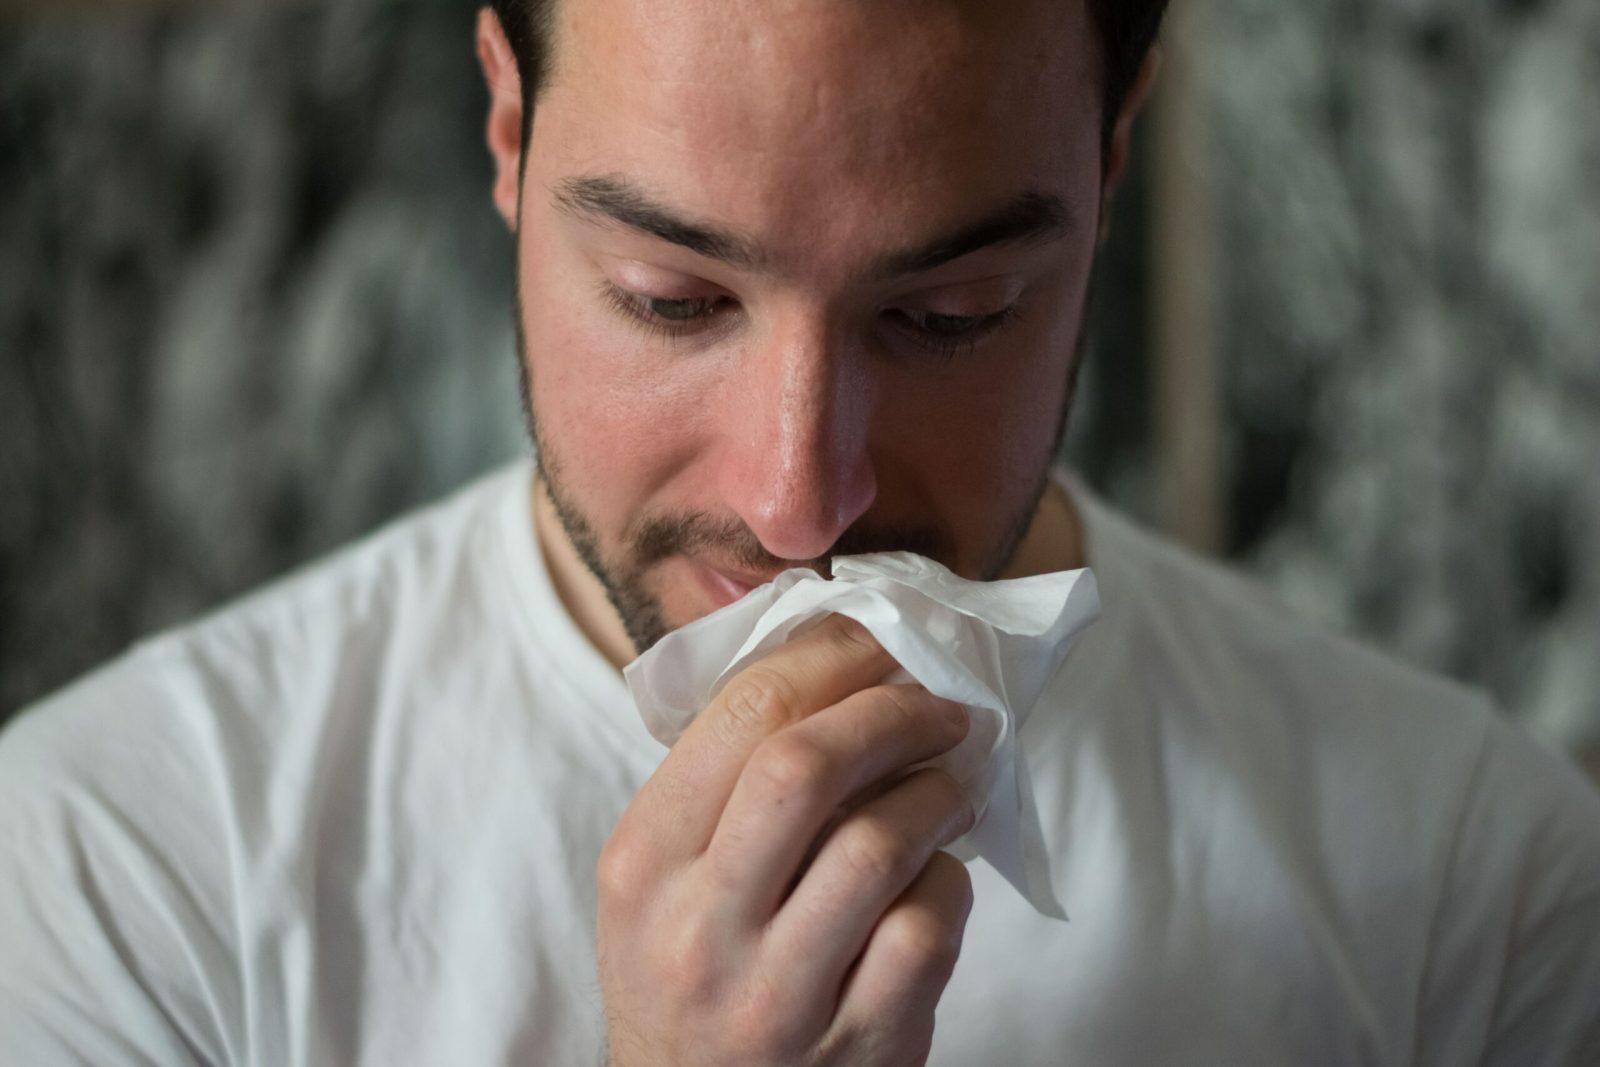 Winter flu season